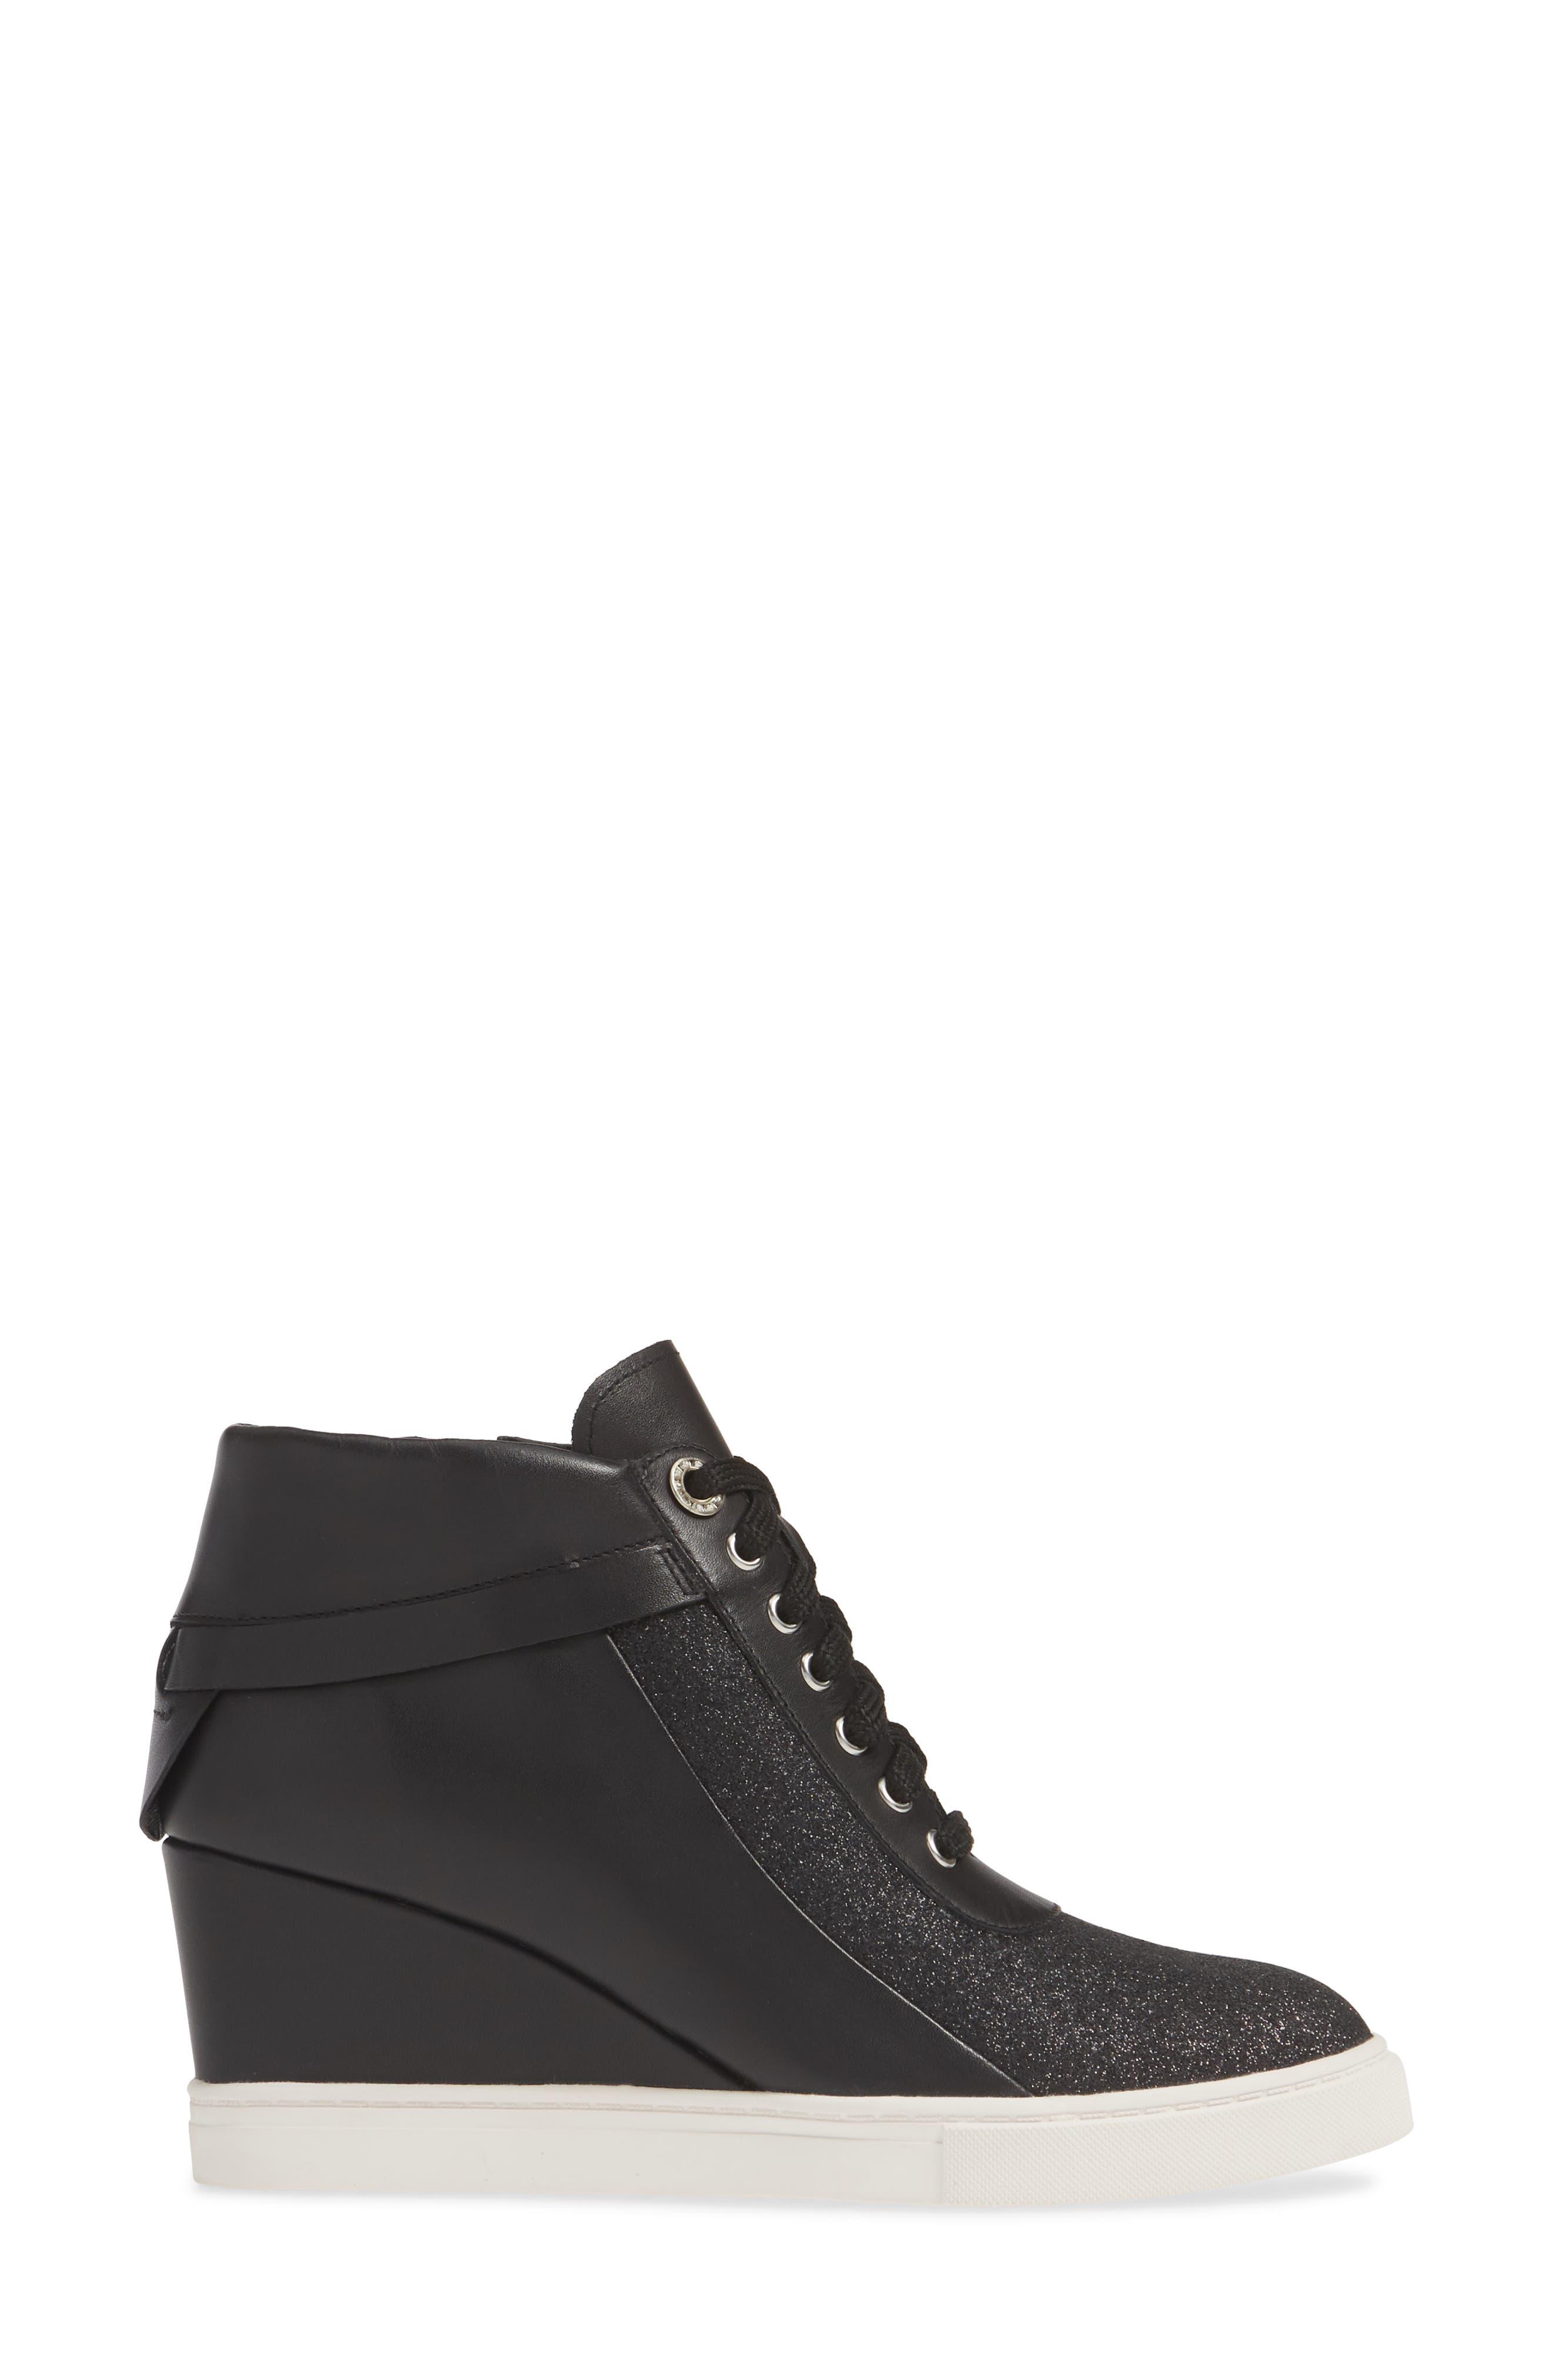 LINEA PAOLO, Freja Wedge Sneaker, Alternate thumbnail 3, color, BLACK GLISTEN LEATHER